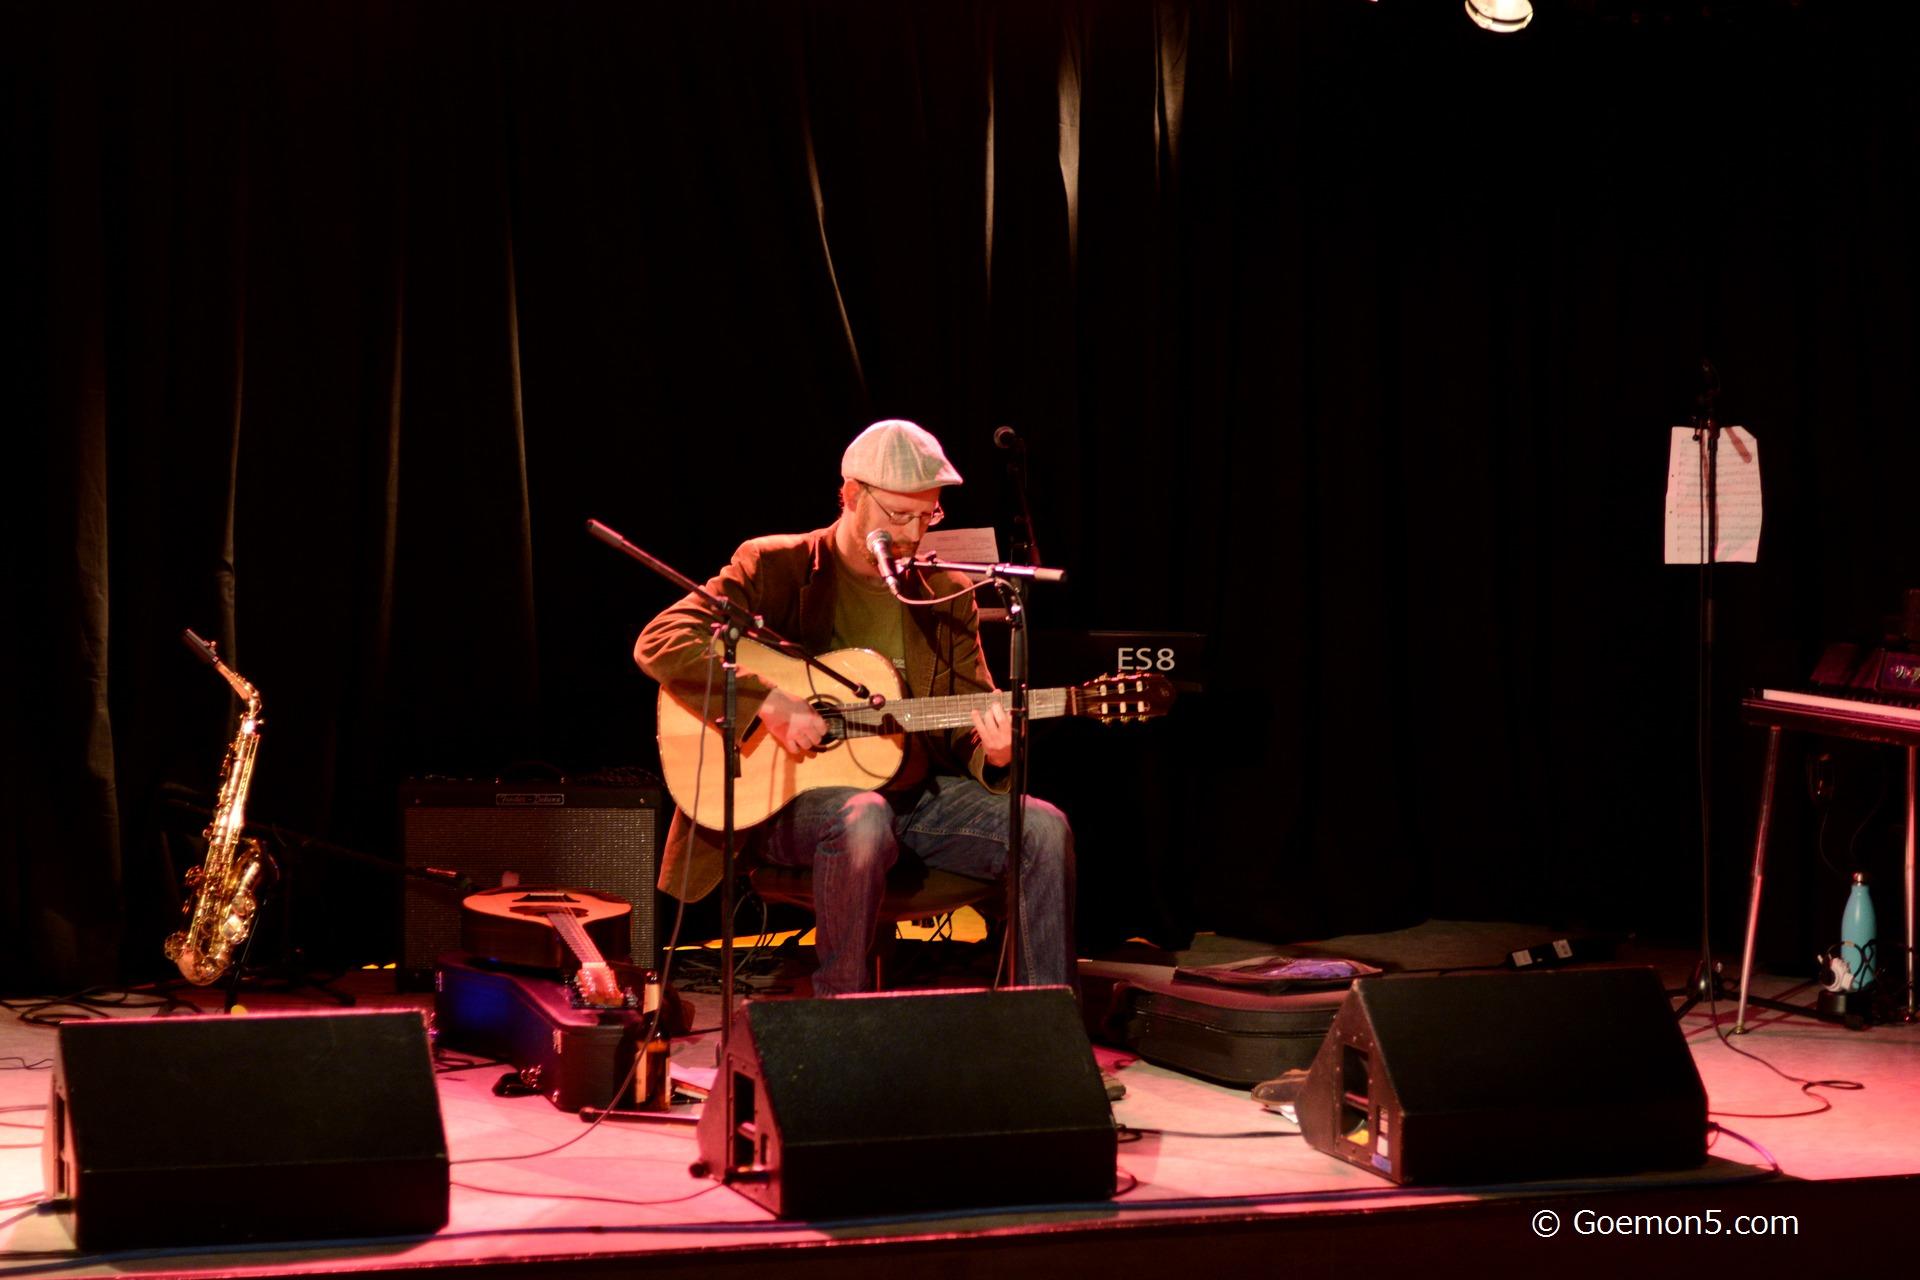 Thomas Strauch at ParkClub 05